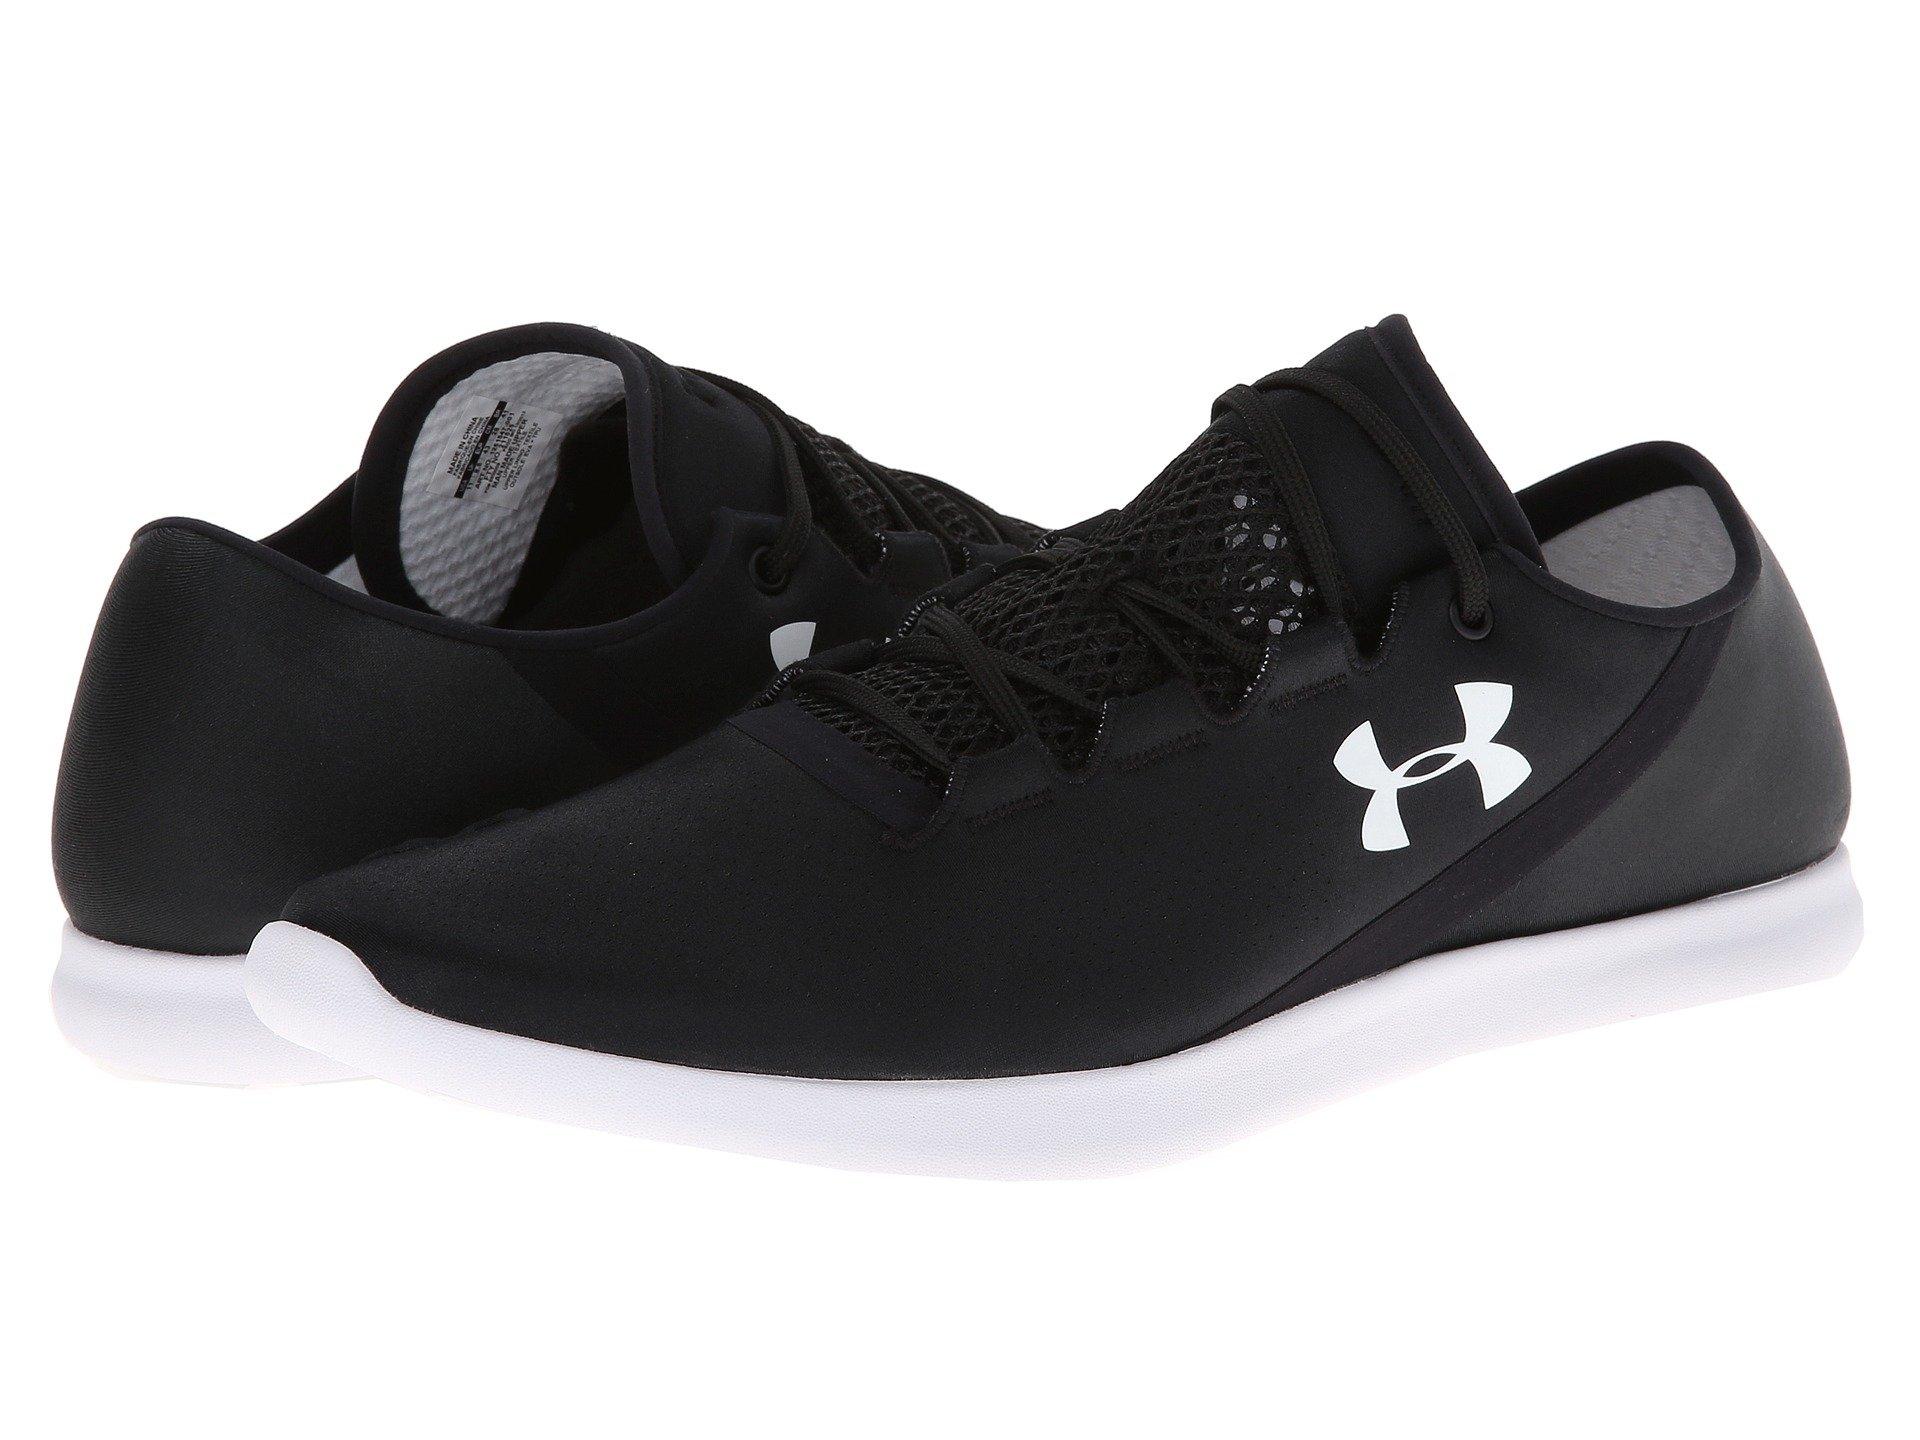 Under Armour Women S Shoes Size